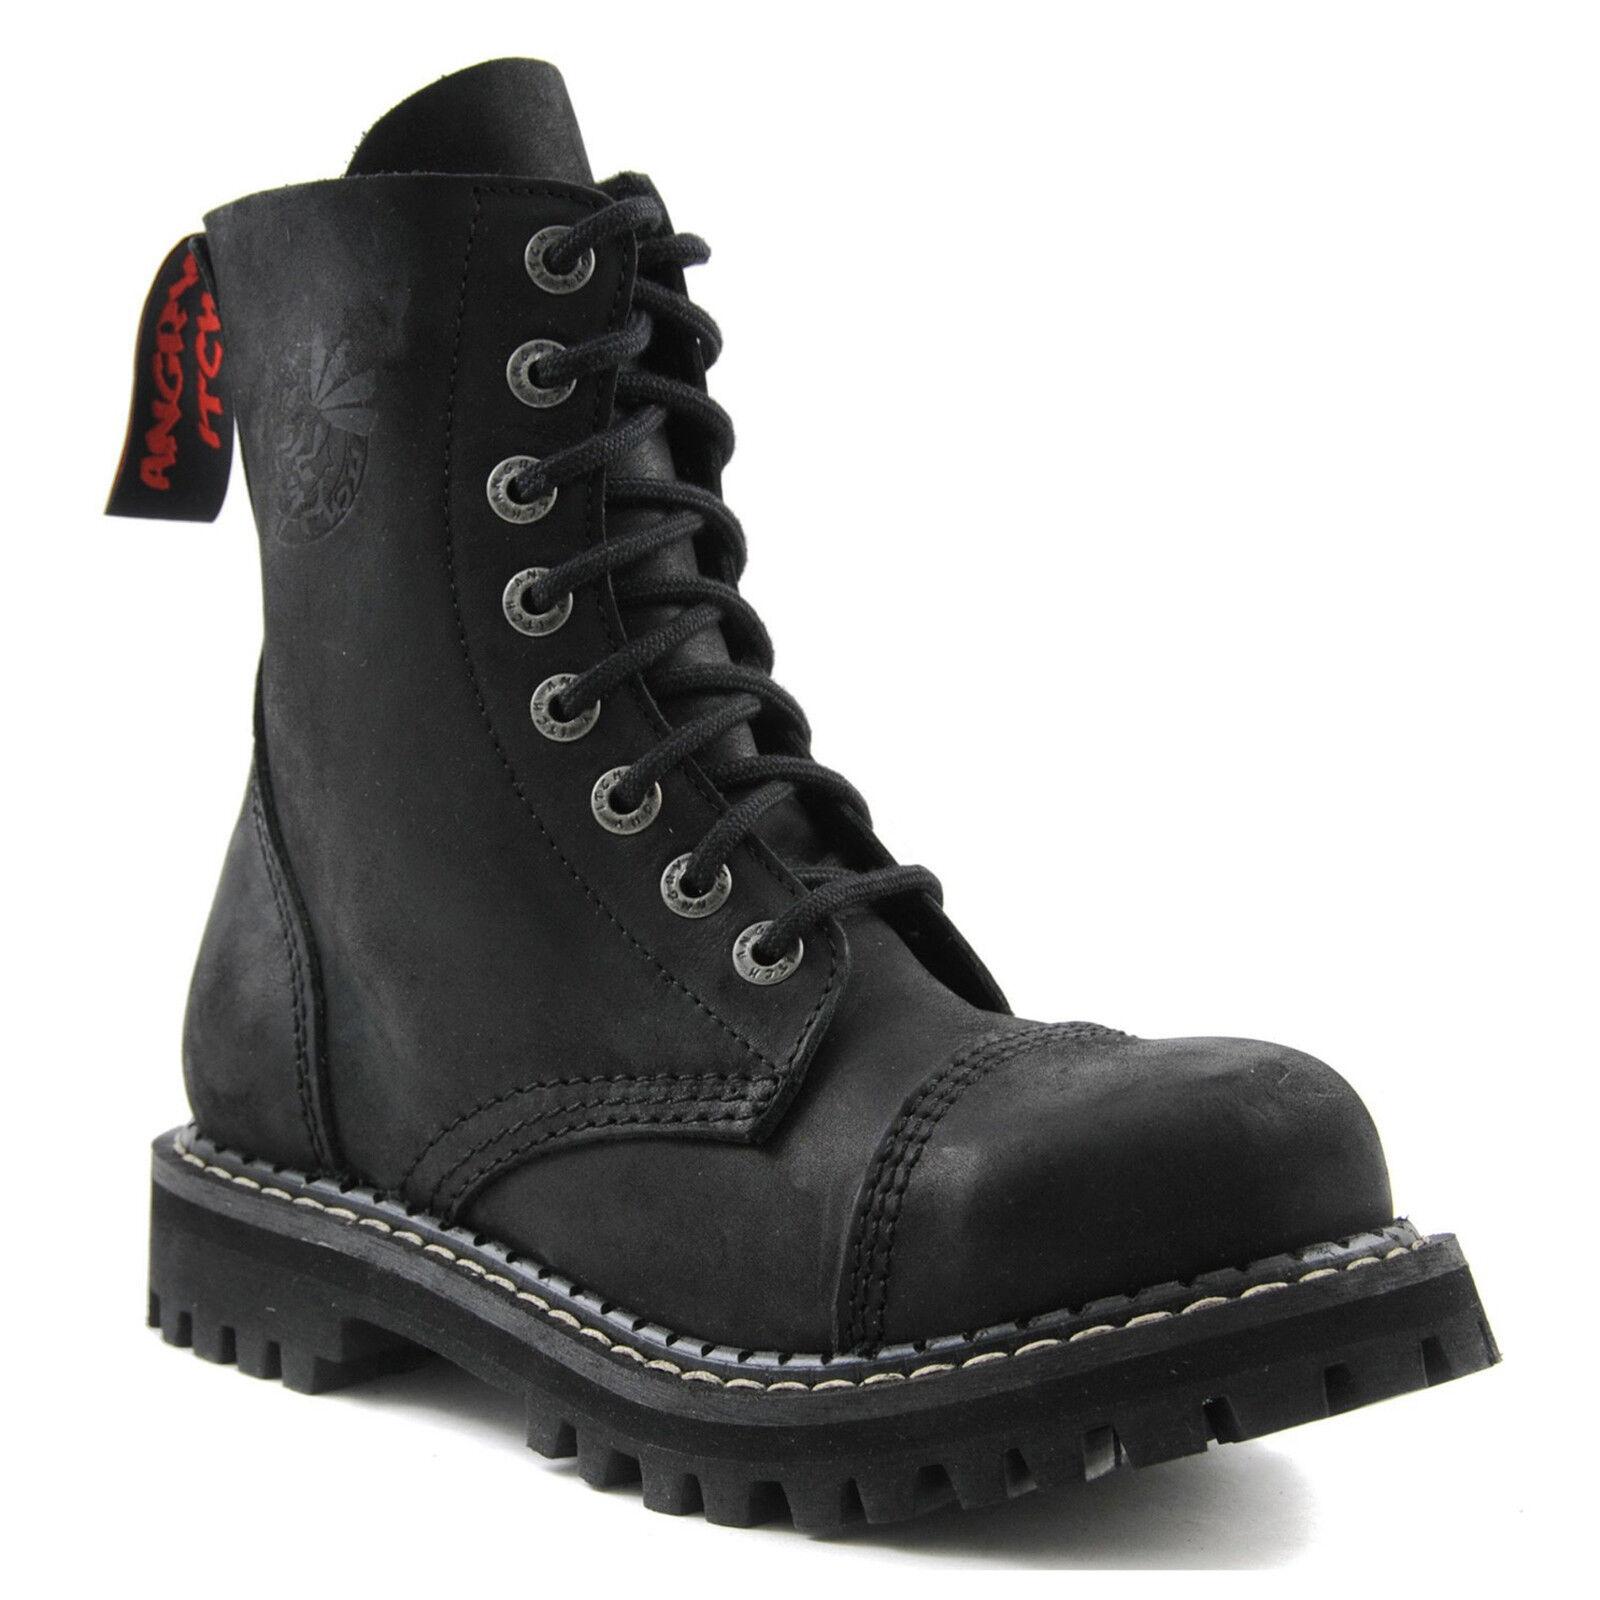 Angry Itch - Vintage 8-Loch Light Stiefel AI08/VBL/LE Vintage - Black Ranger Armee Leder V a63a50